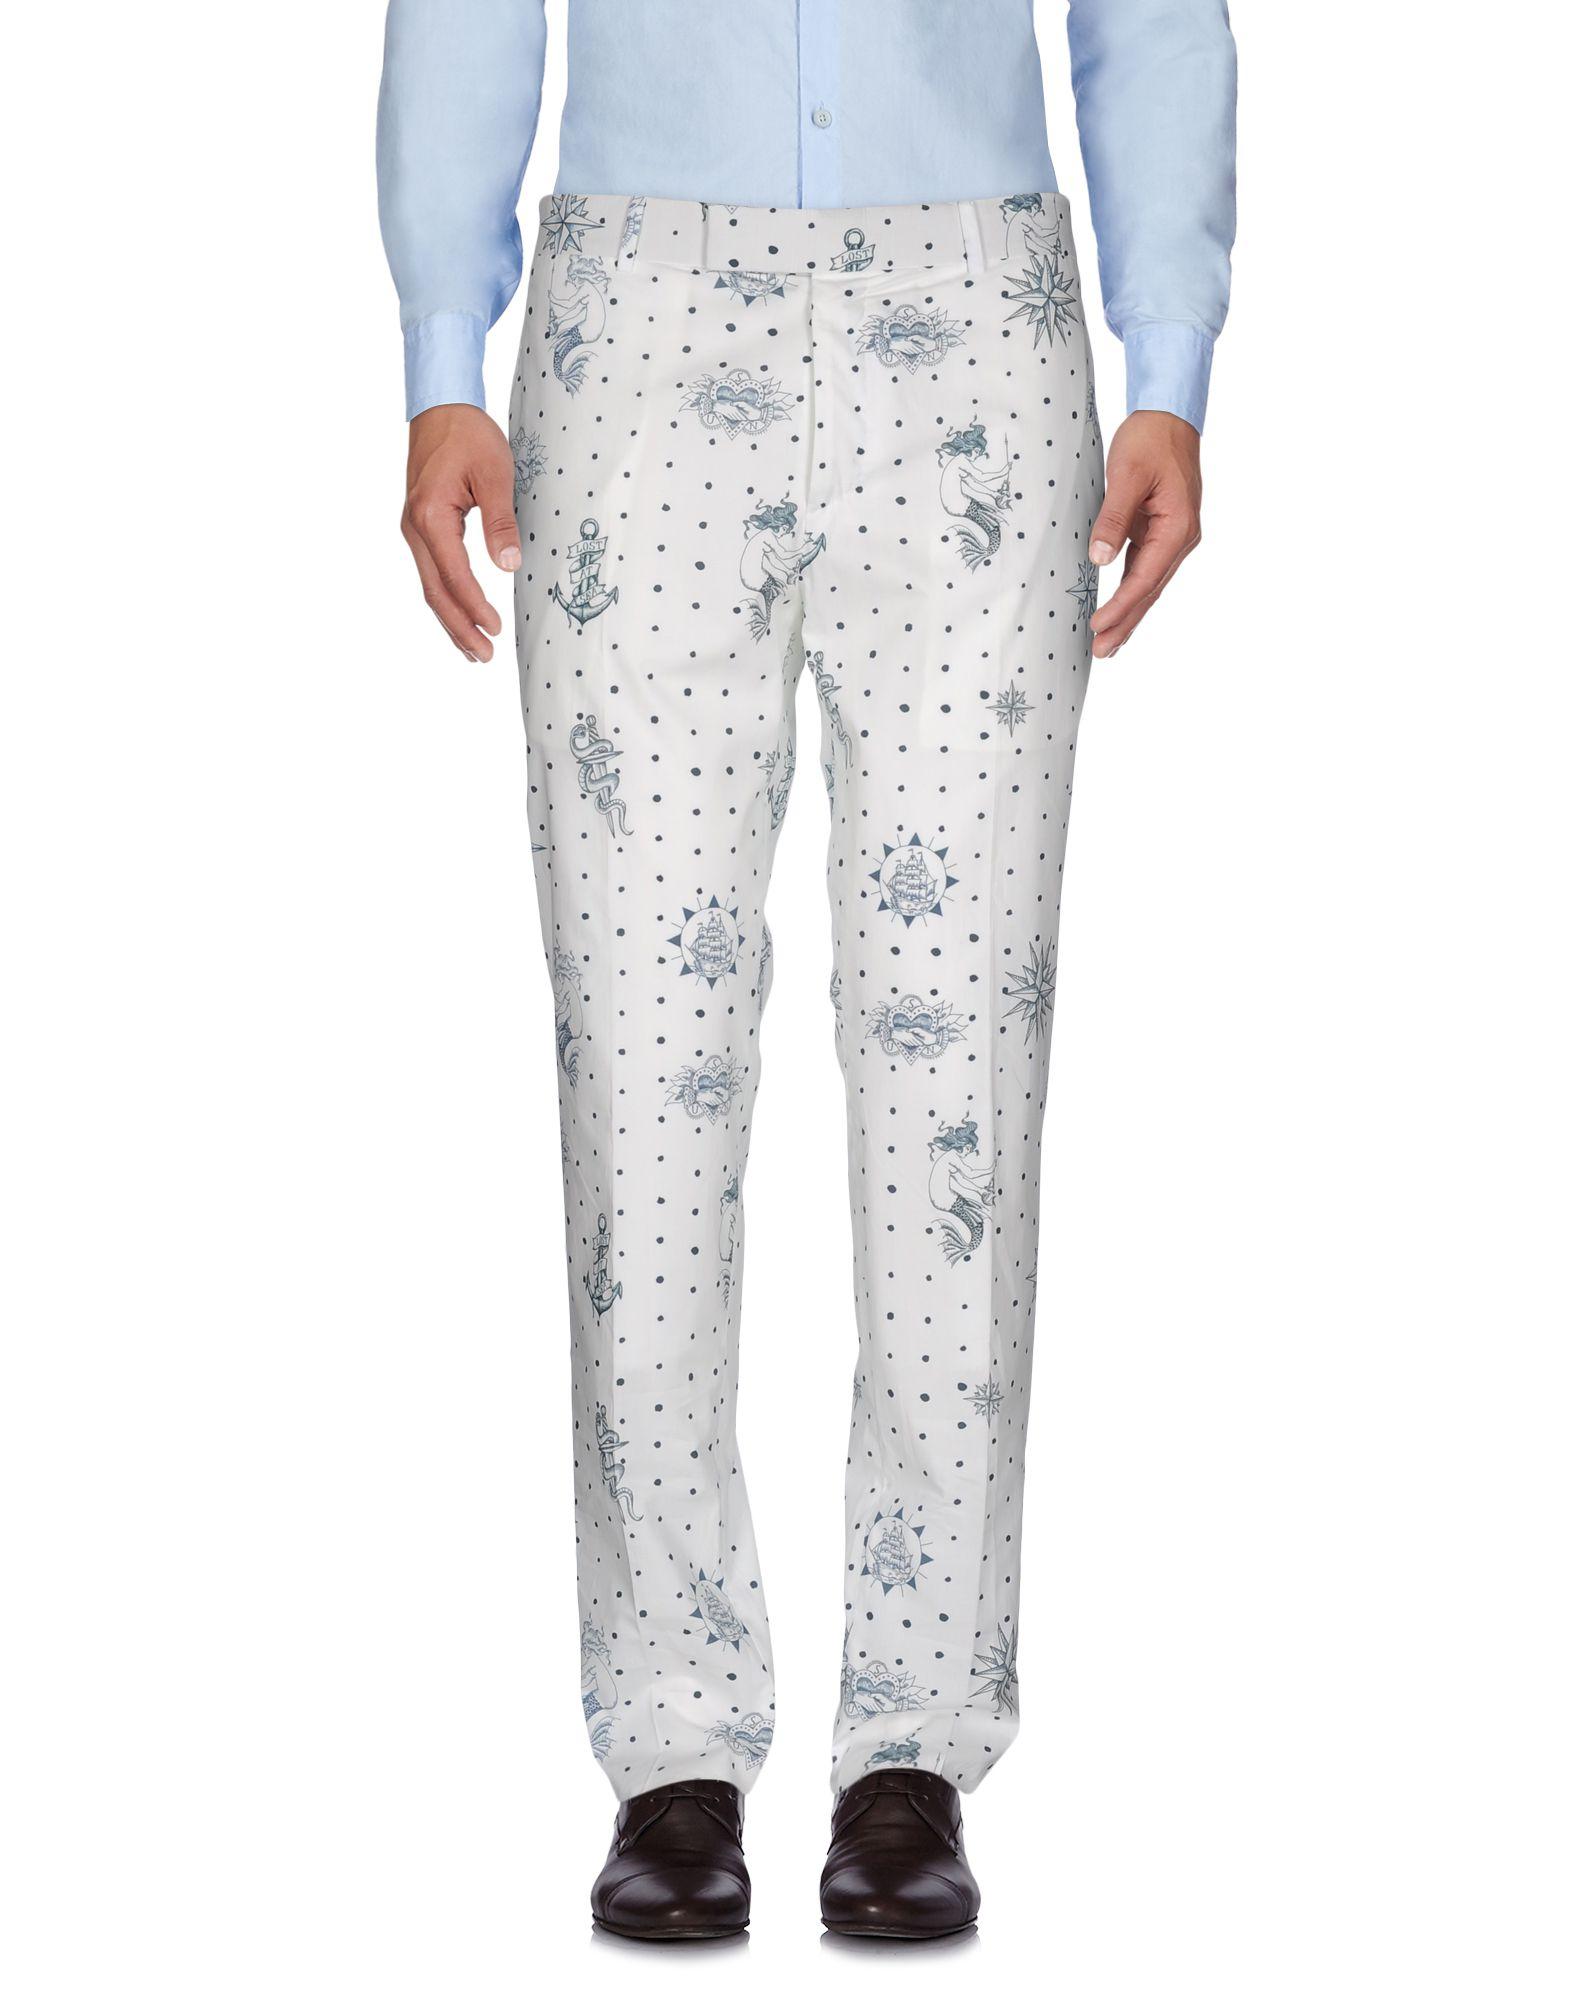 Pantalone Alexander Uomo Mcqueen Uomo Alexander - 36923766EN f6d95d